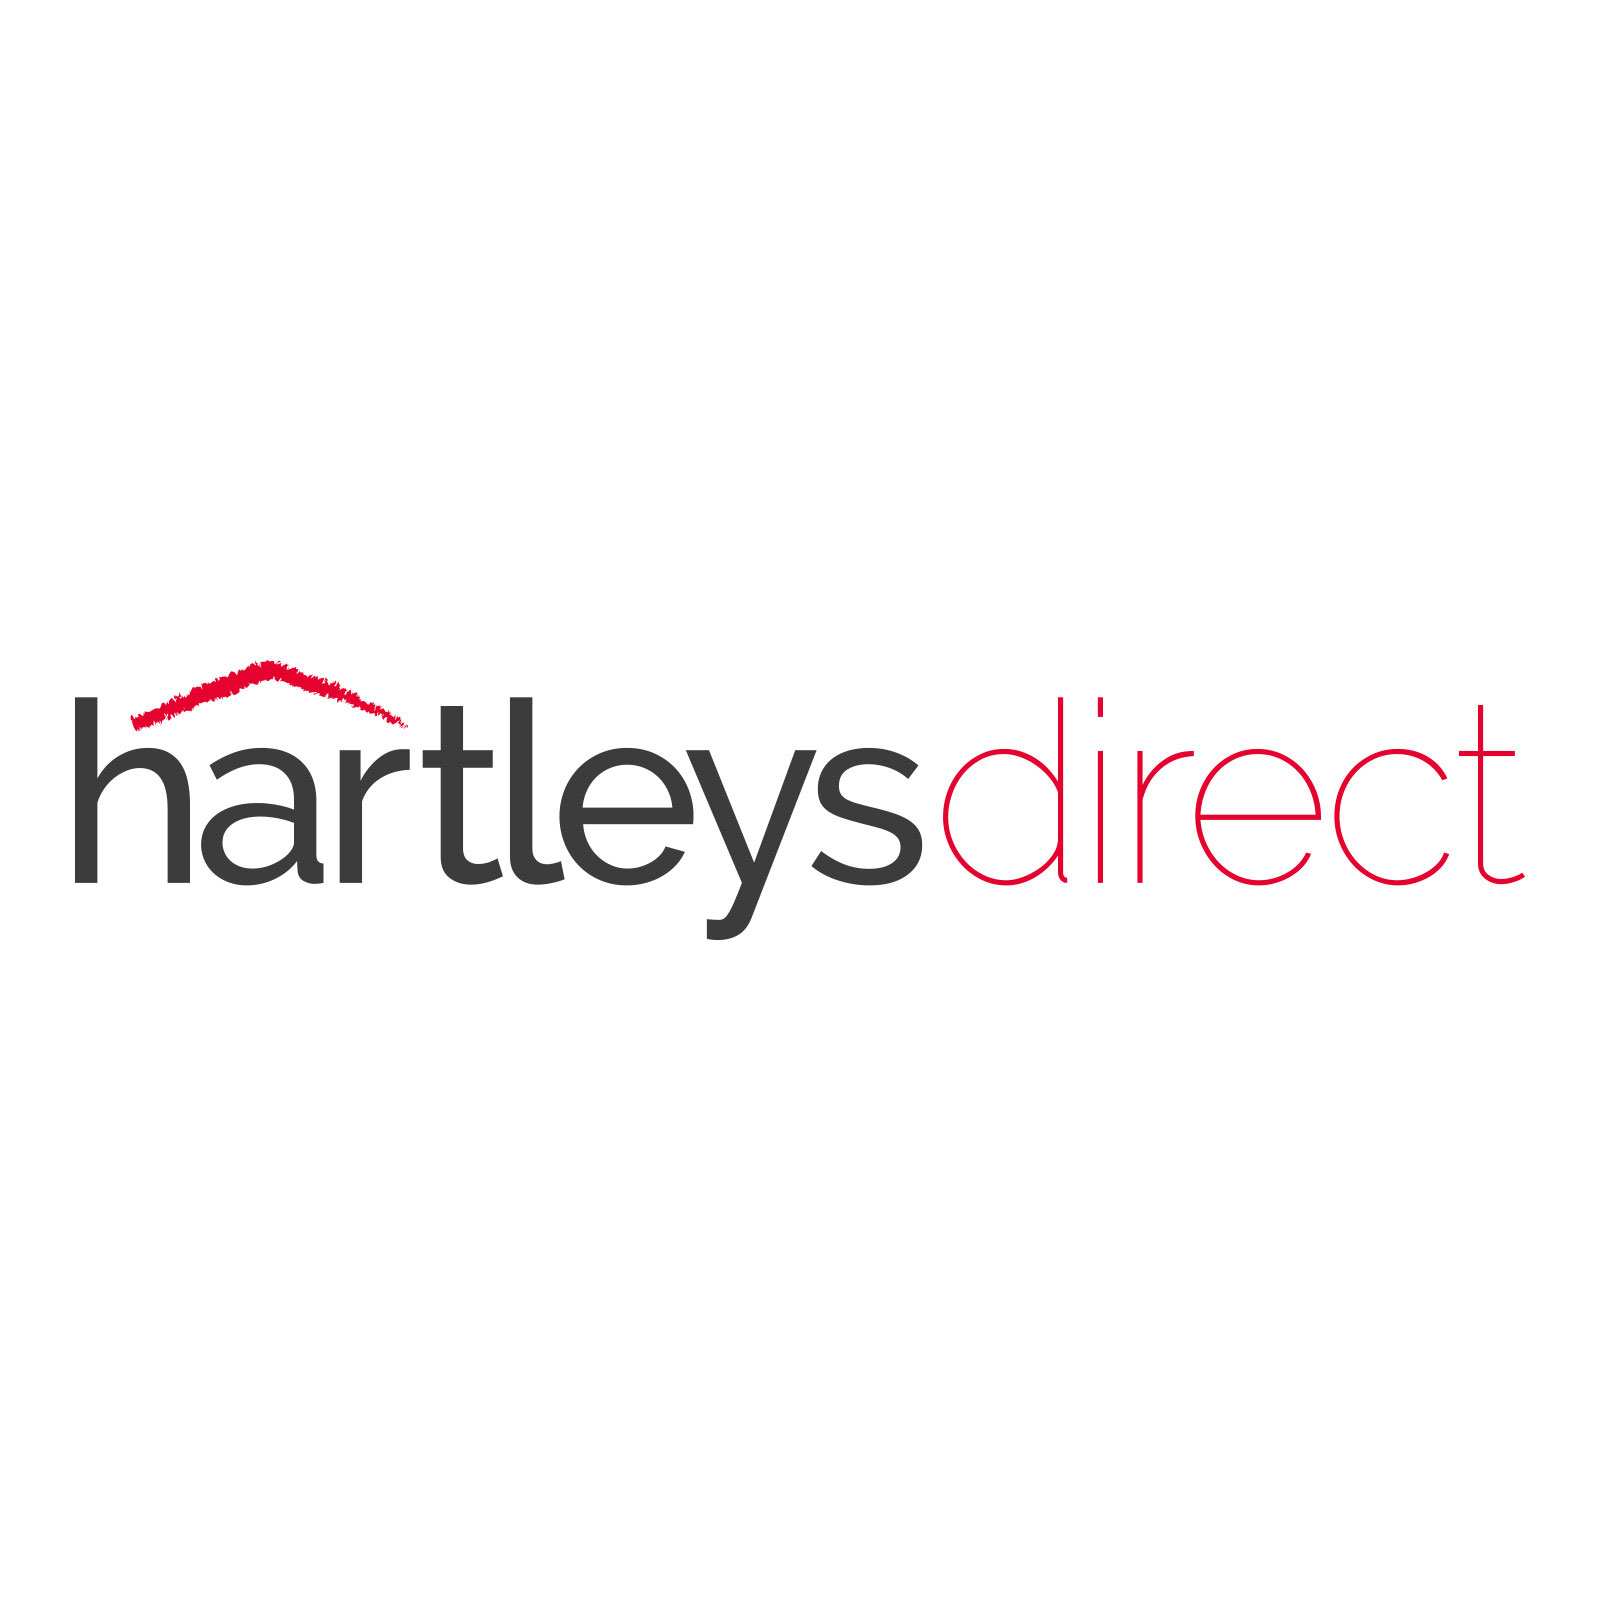 Hartleys-3-Tier-Storage-Unit-with-9-Black-Canvas-Bins-on-White-Background.jpg